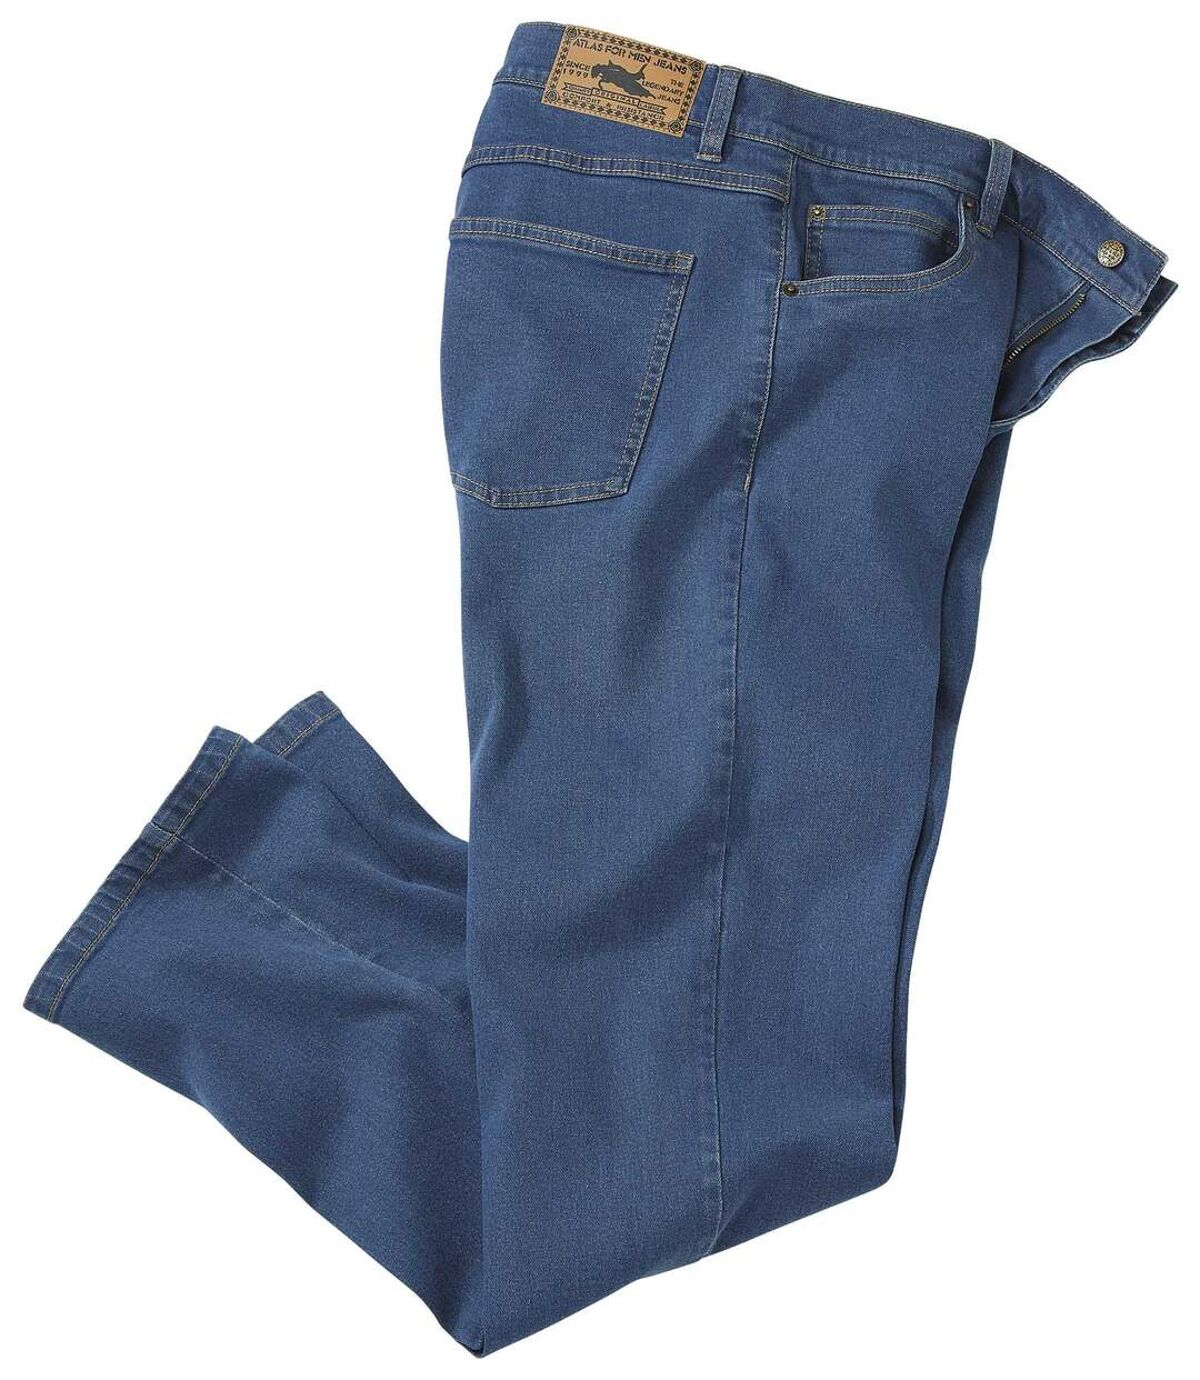 Wygodne jeansy Regular ze stretchem  Atlas For Men